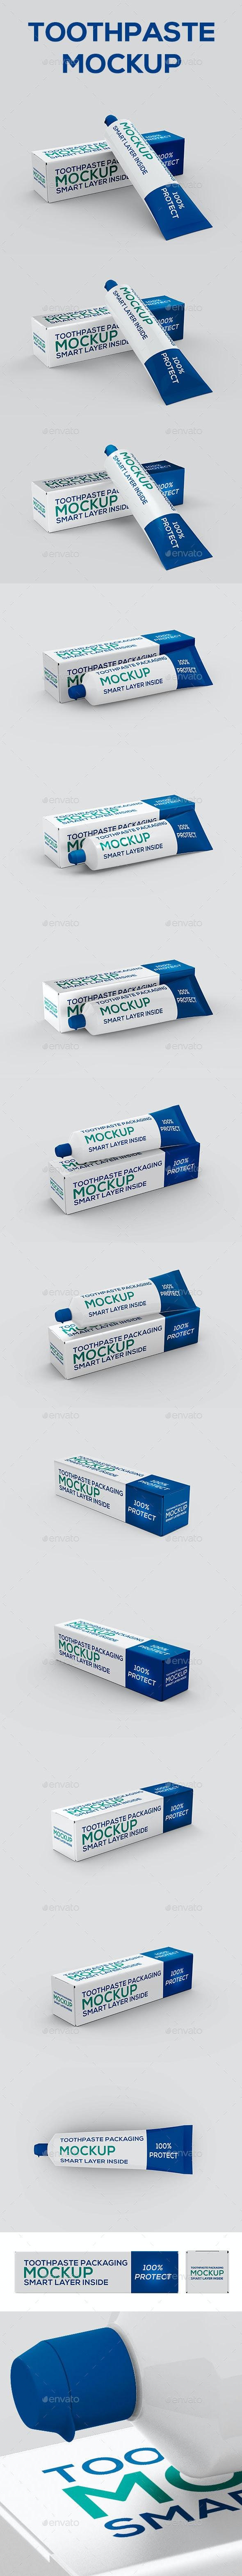 Toothpaste Packaging Mock-up - Beauty Packaging